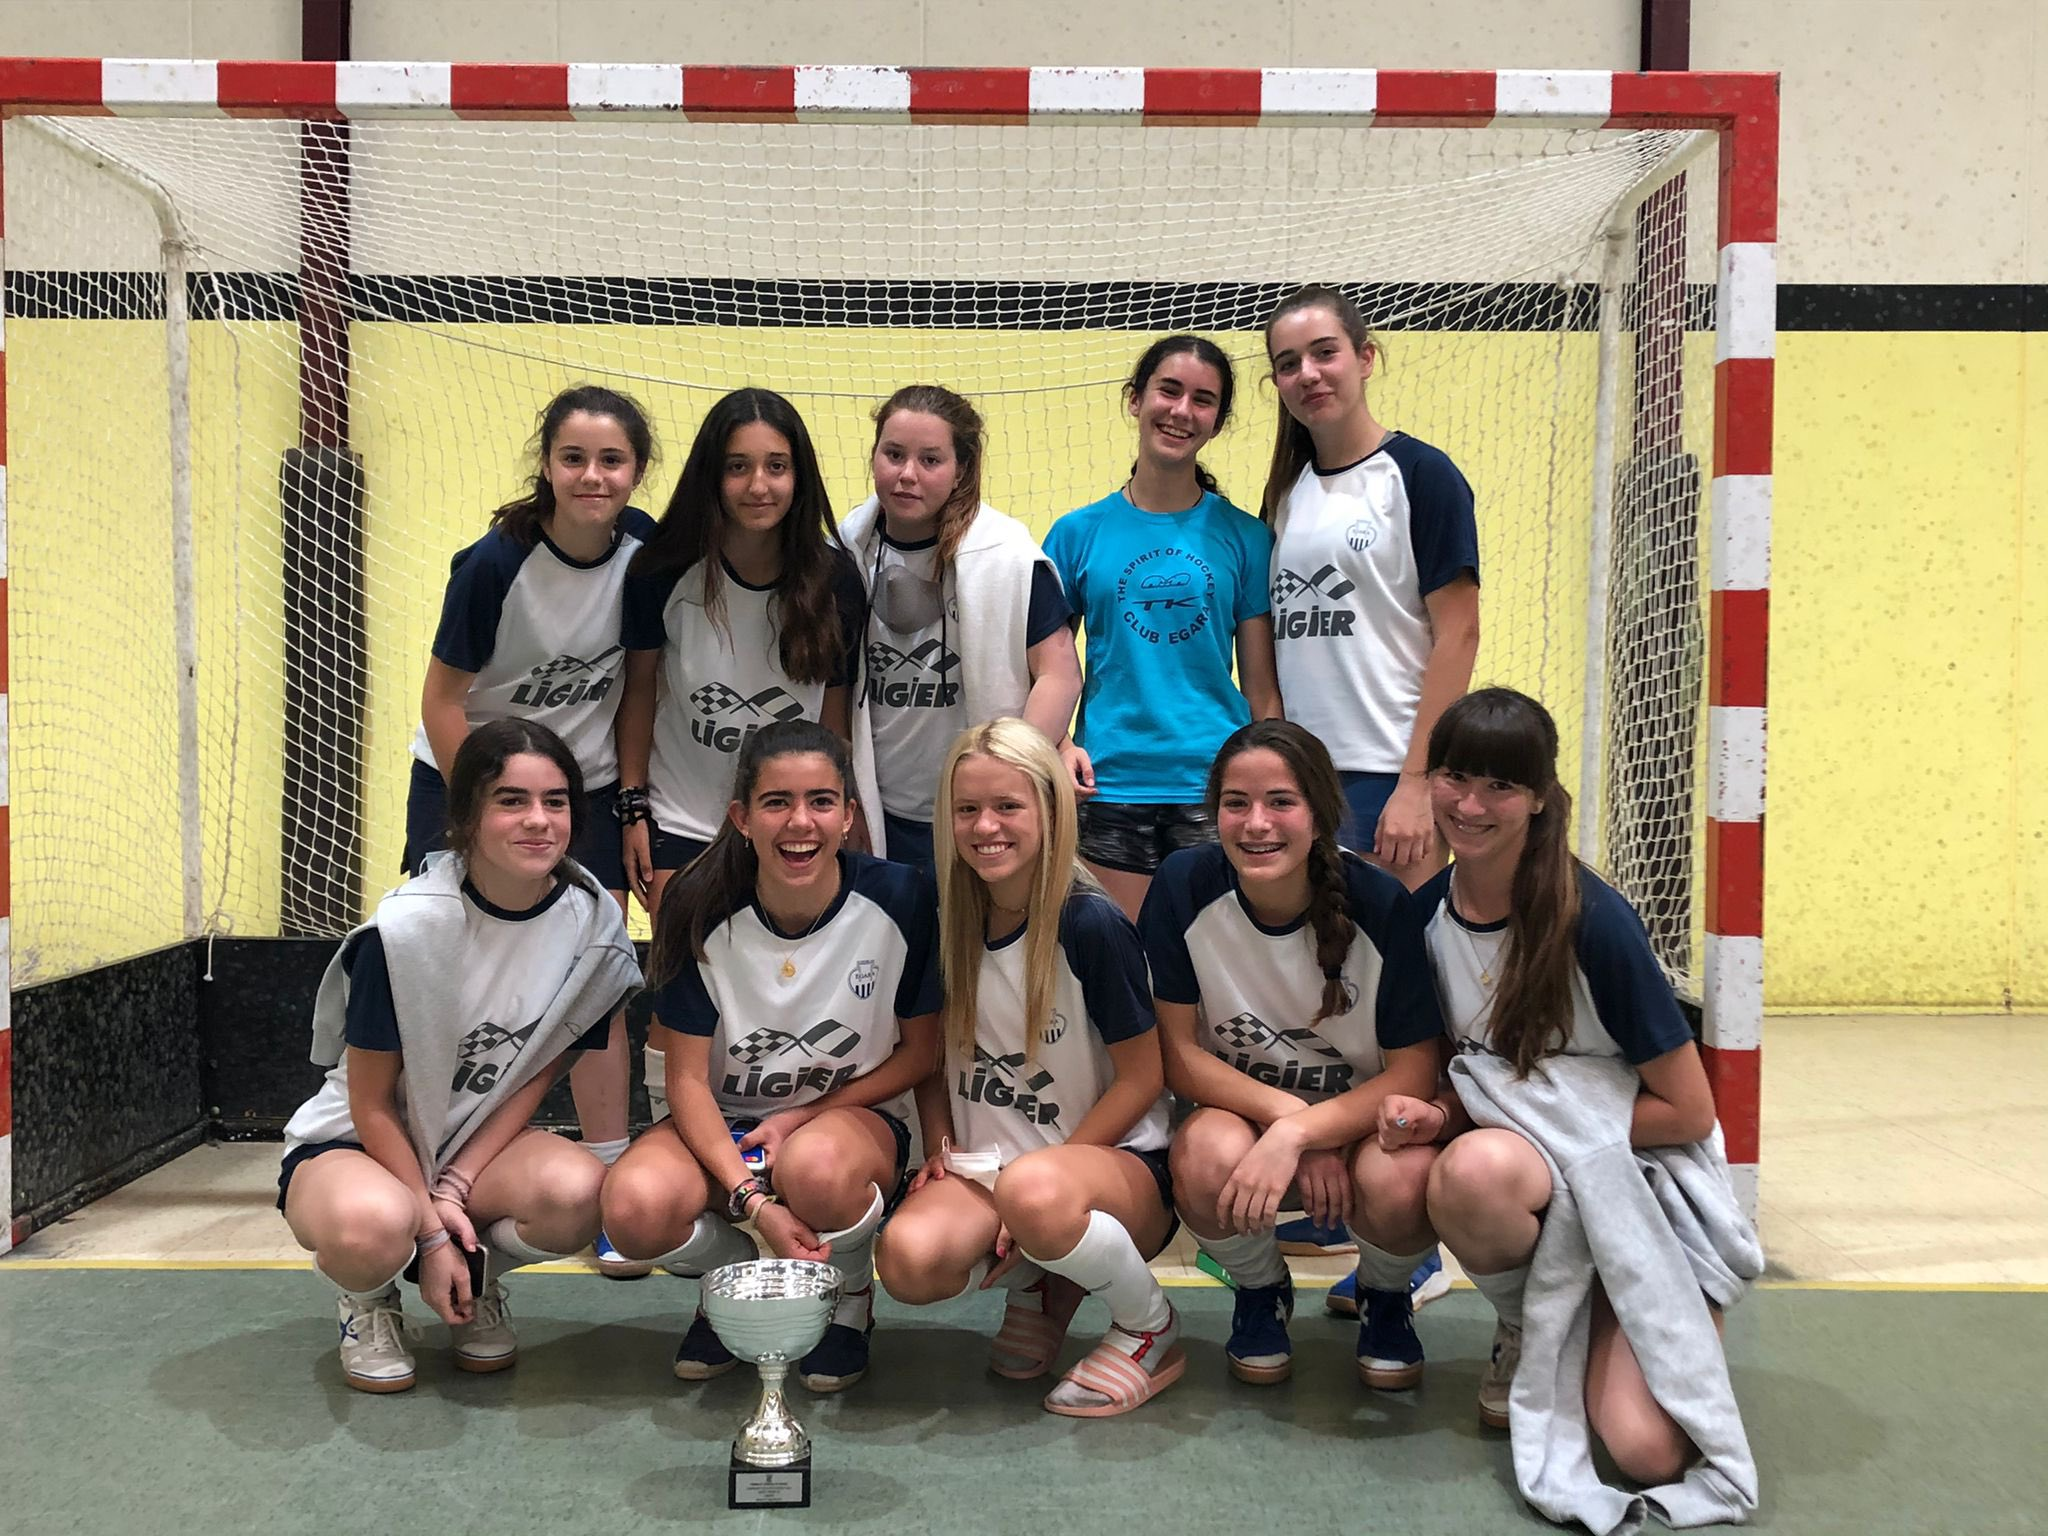 Les campiones d'hoquei sala del Club Egara | FC Hockey